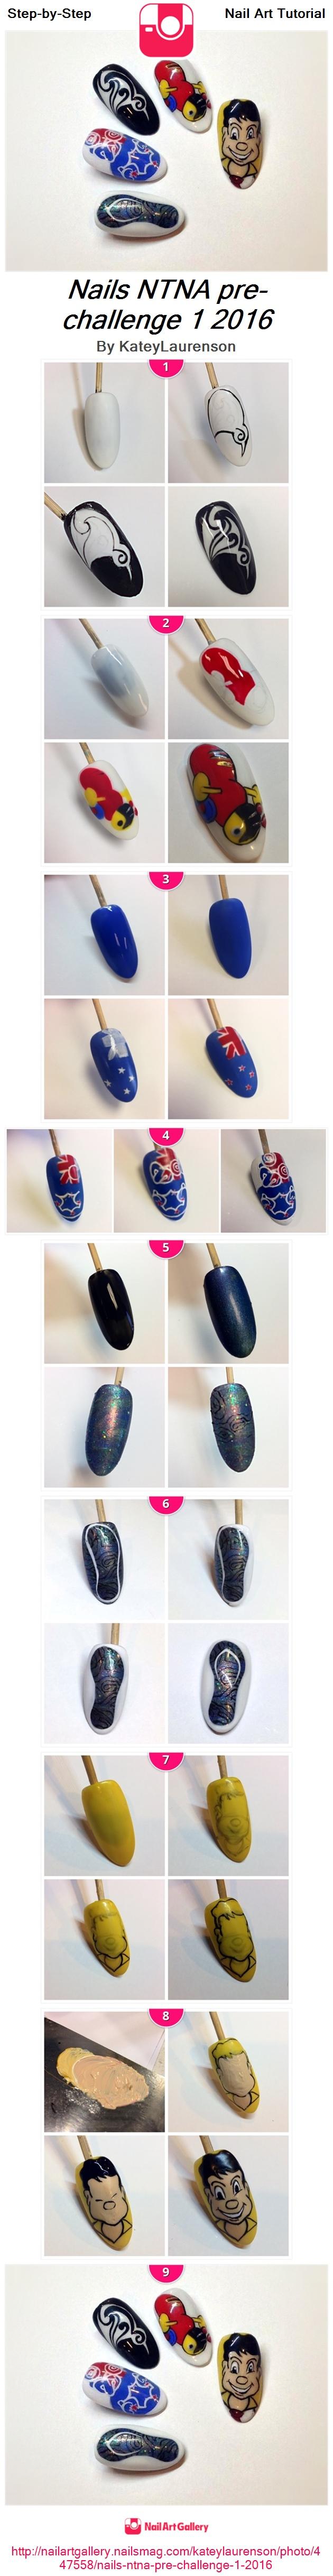 Nails NTNA pre-challenge 1 2016 - Nail Art Gallery